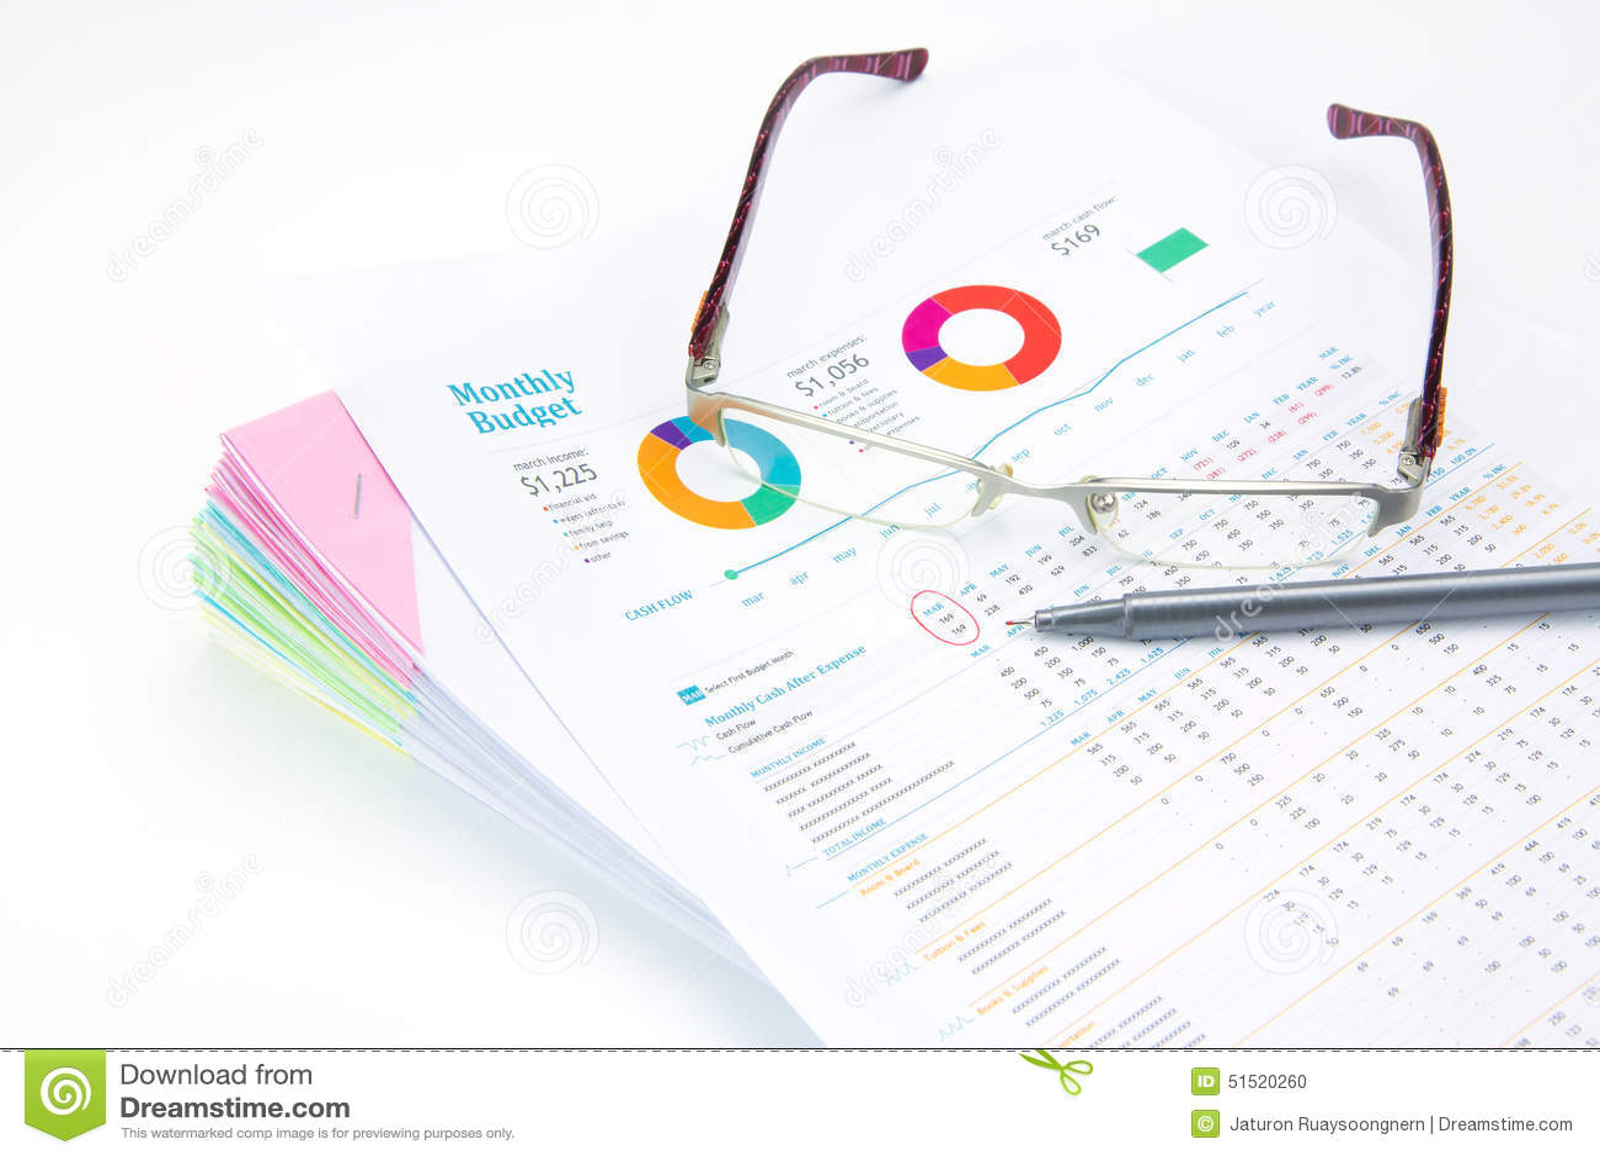 NASDAQ:LFVN - LifeVantage Stock Price, News, & Analysis